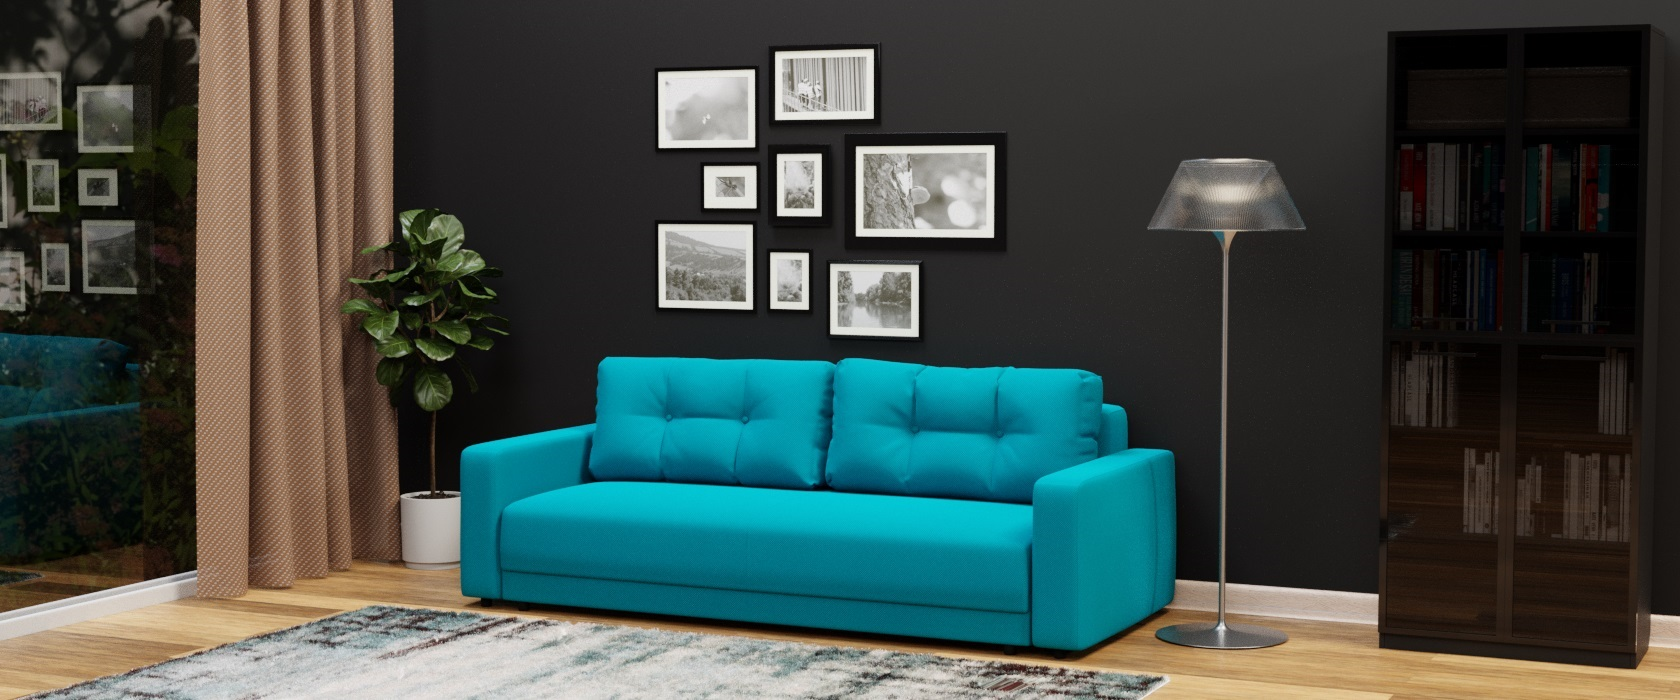 Тримісний диван Famiglia - Фото 2 - Pufetto